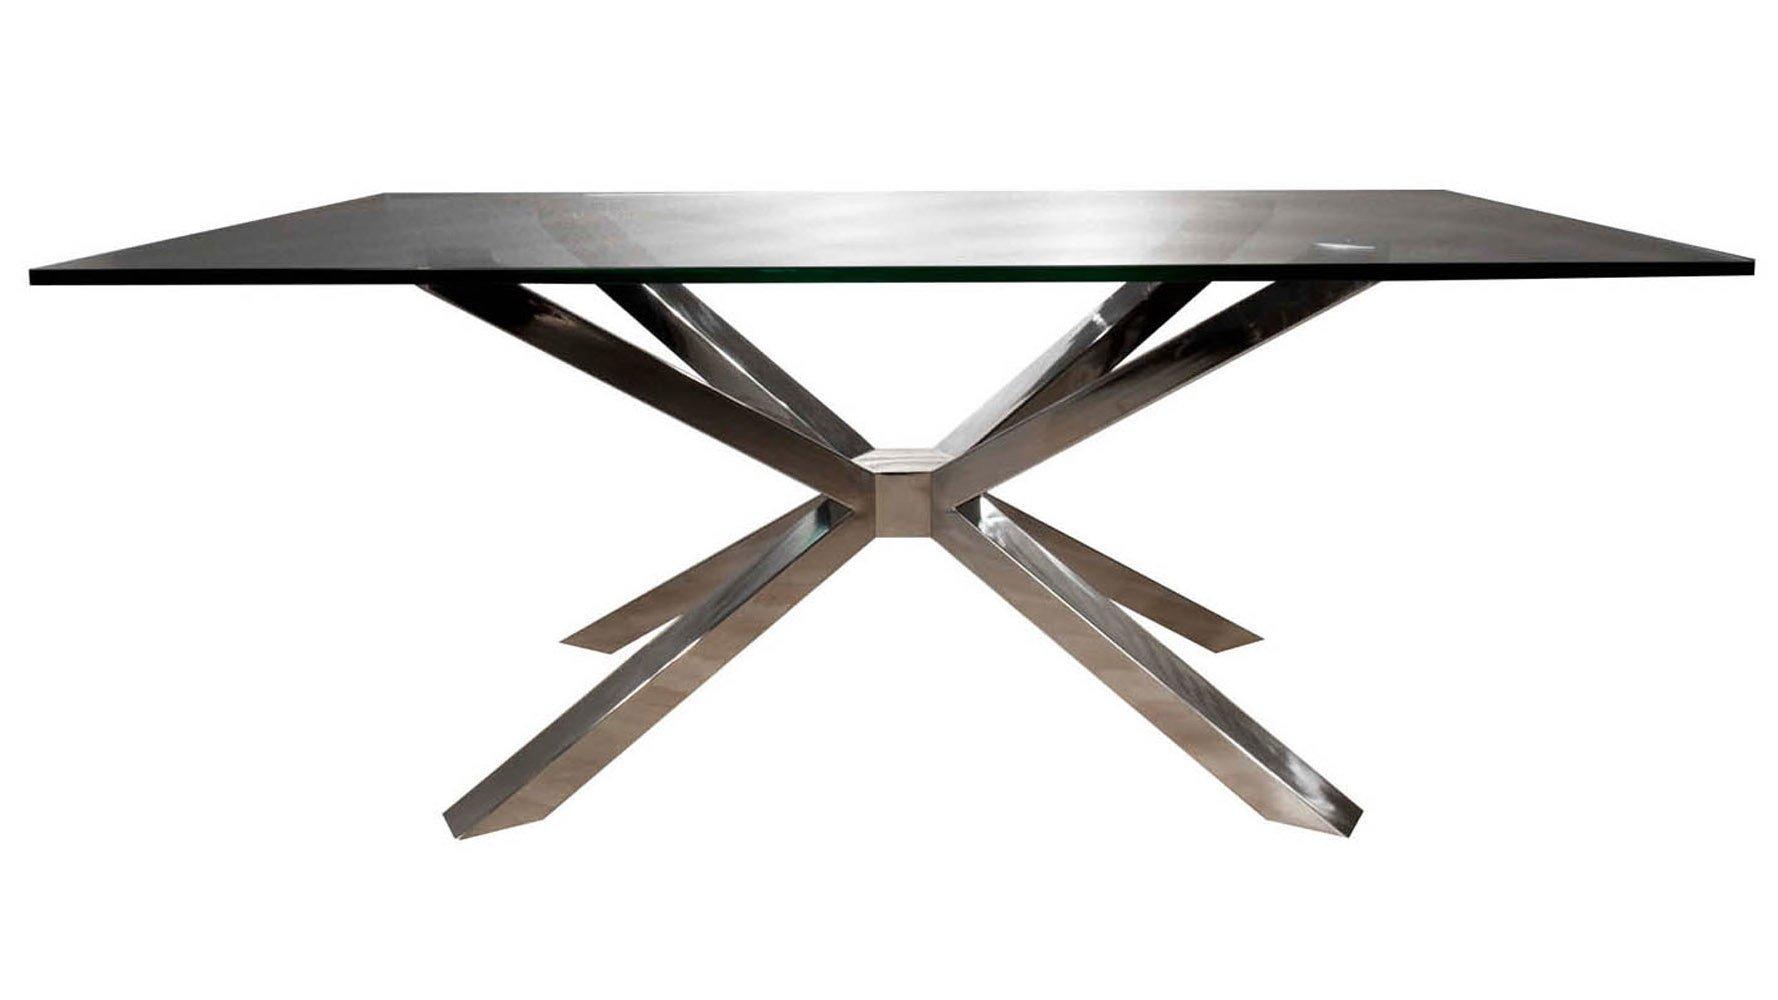 Modern Cointet Rectangle Dining Table Base Stainless  : moderncointetrectanglediningtablebasestainlesssteel from www.zurifurniture.com size 1778 x 1000 jpeg 78kB